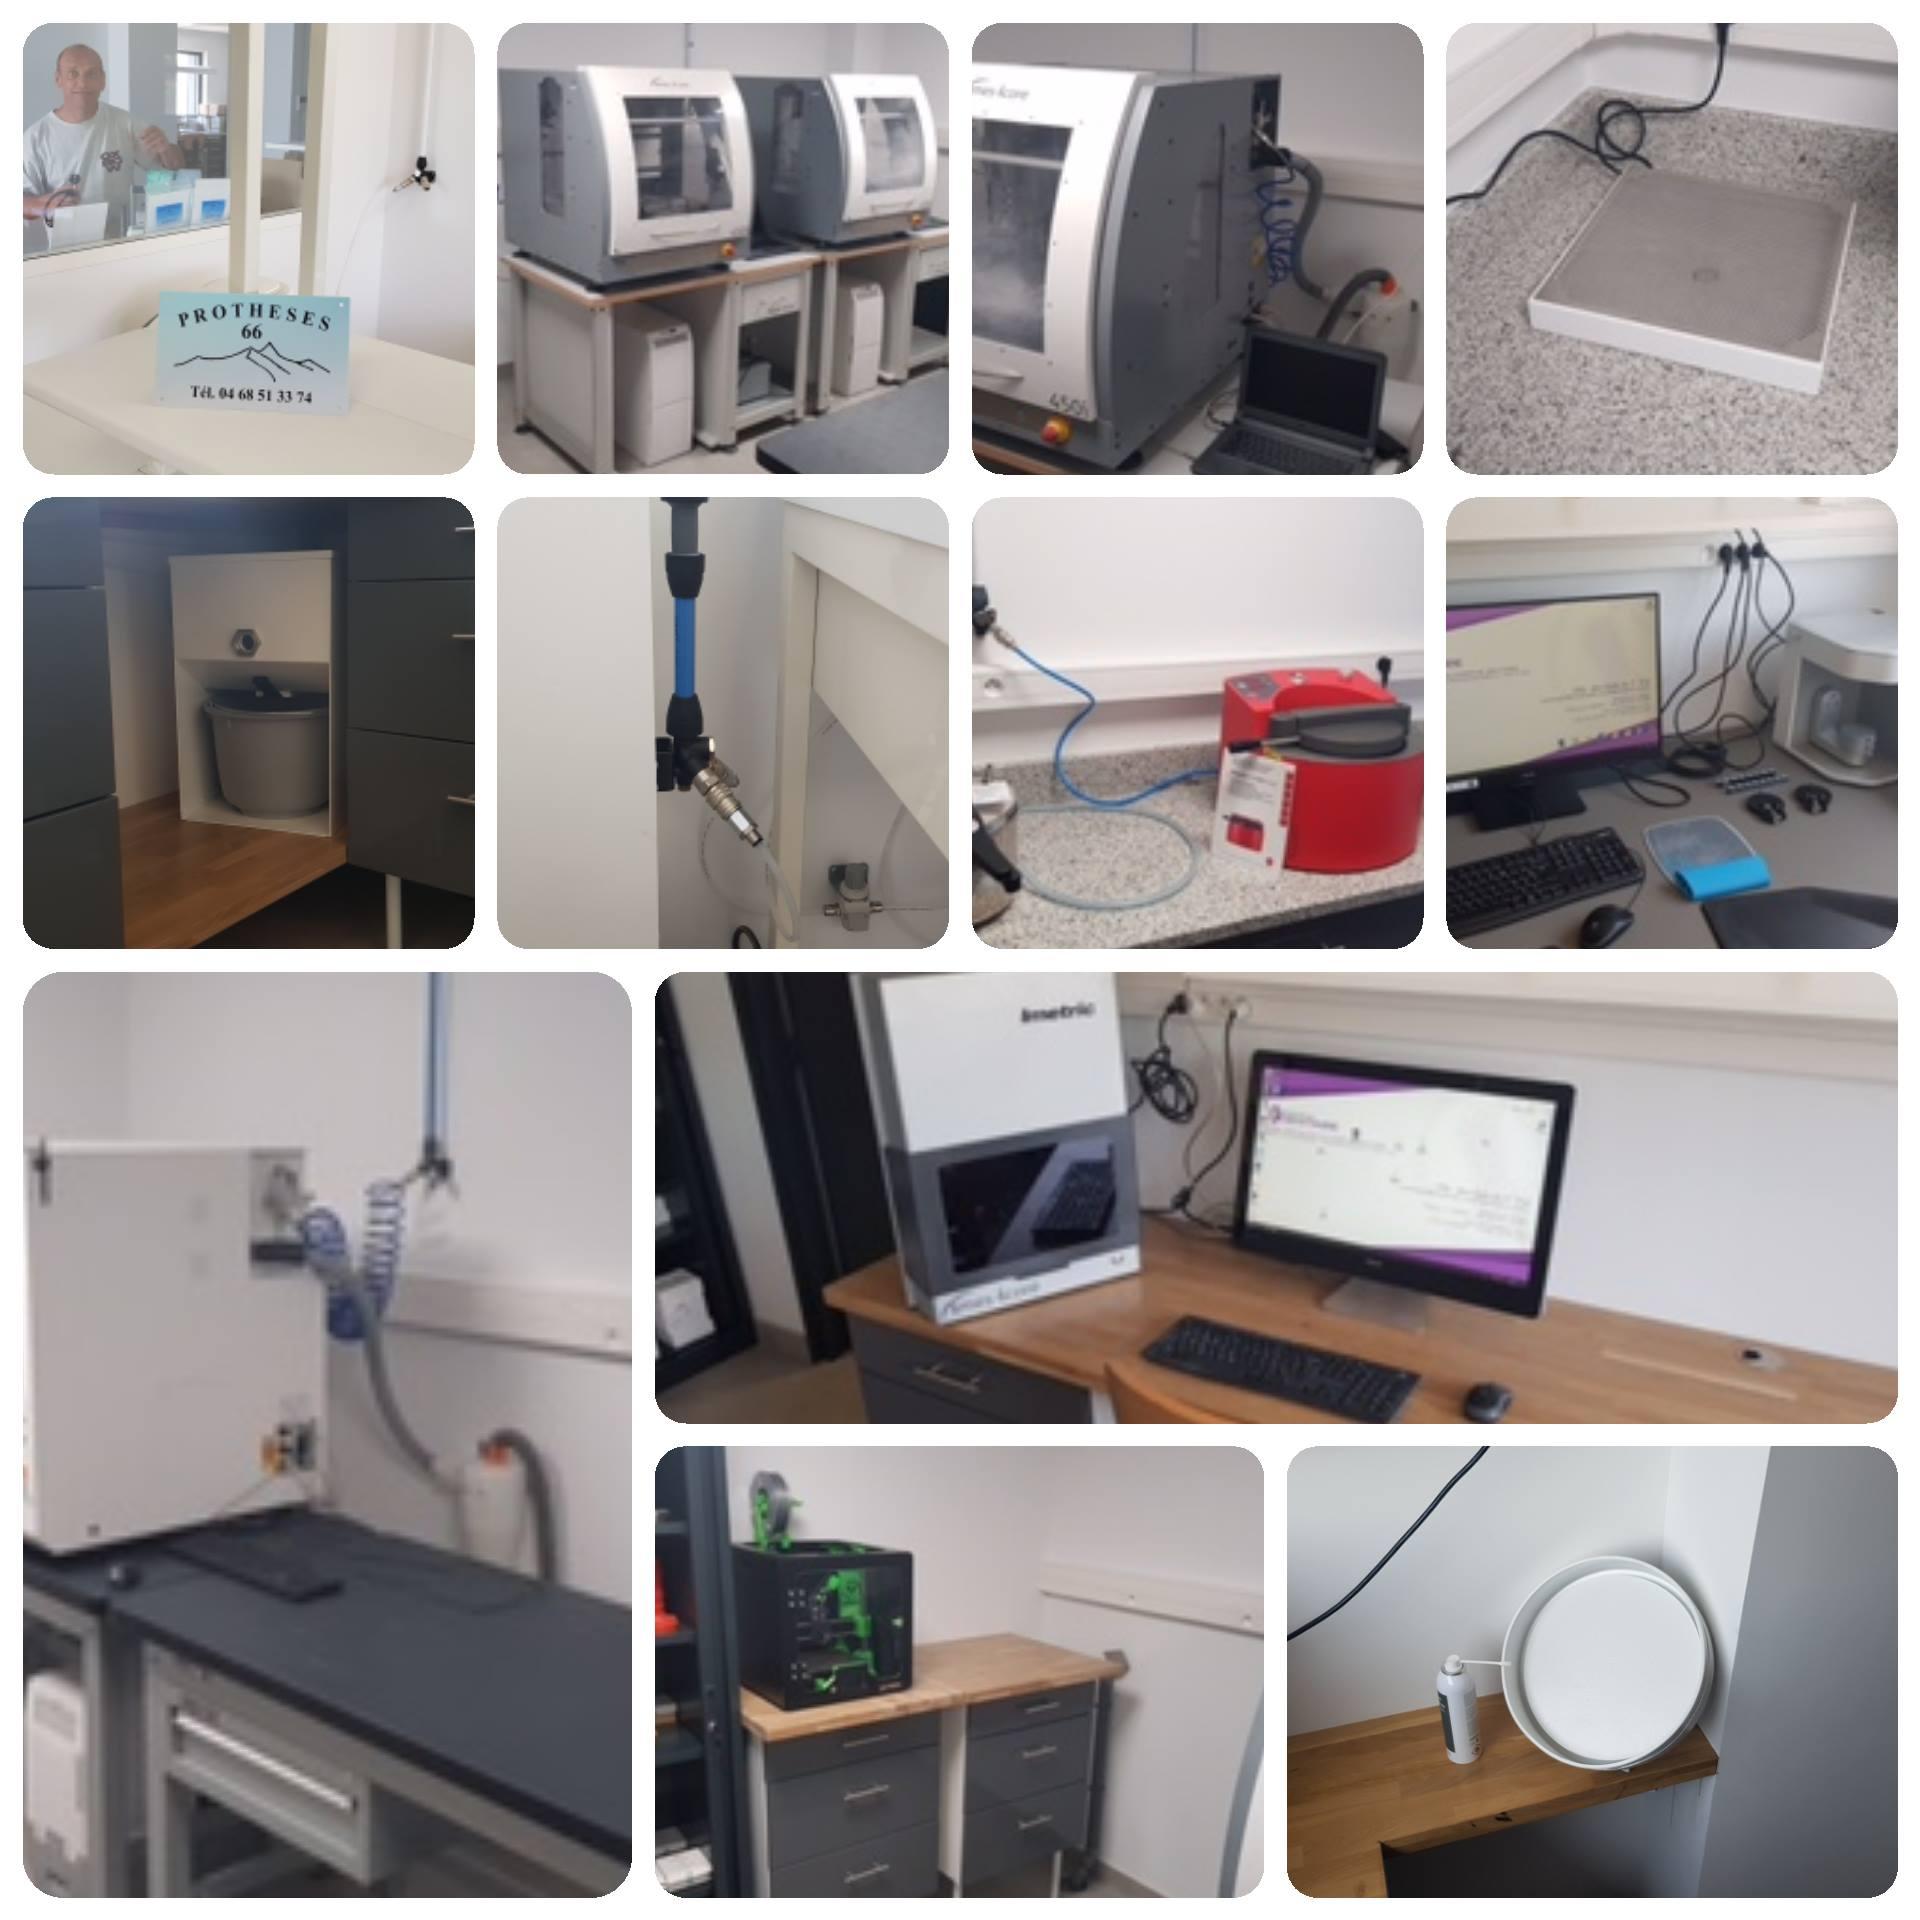 Laboratoire Prothese 66